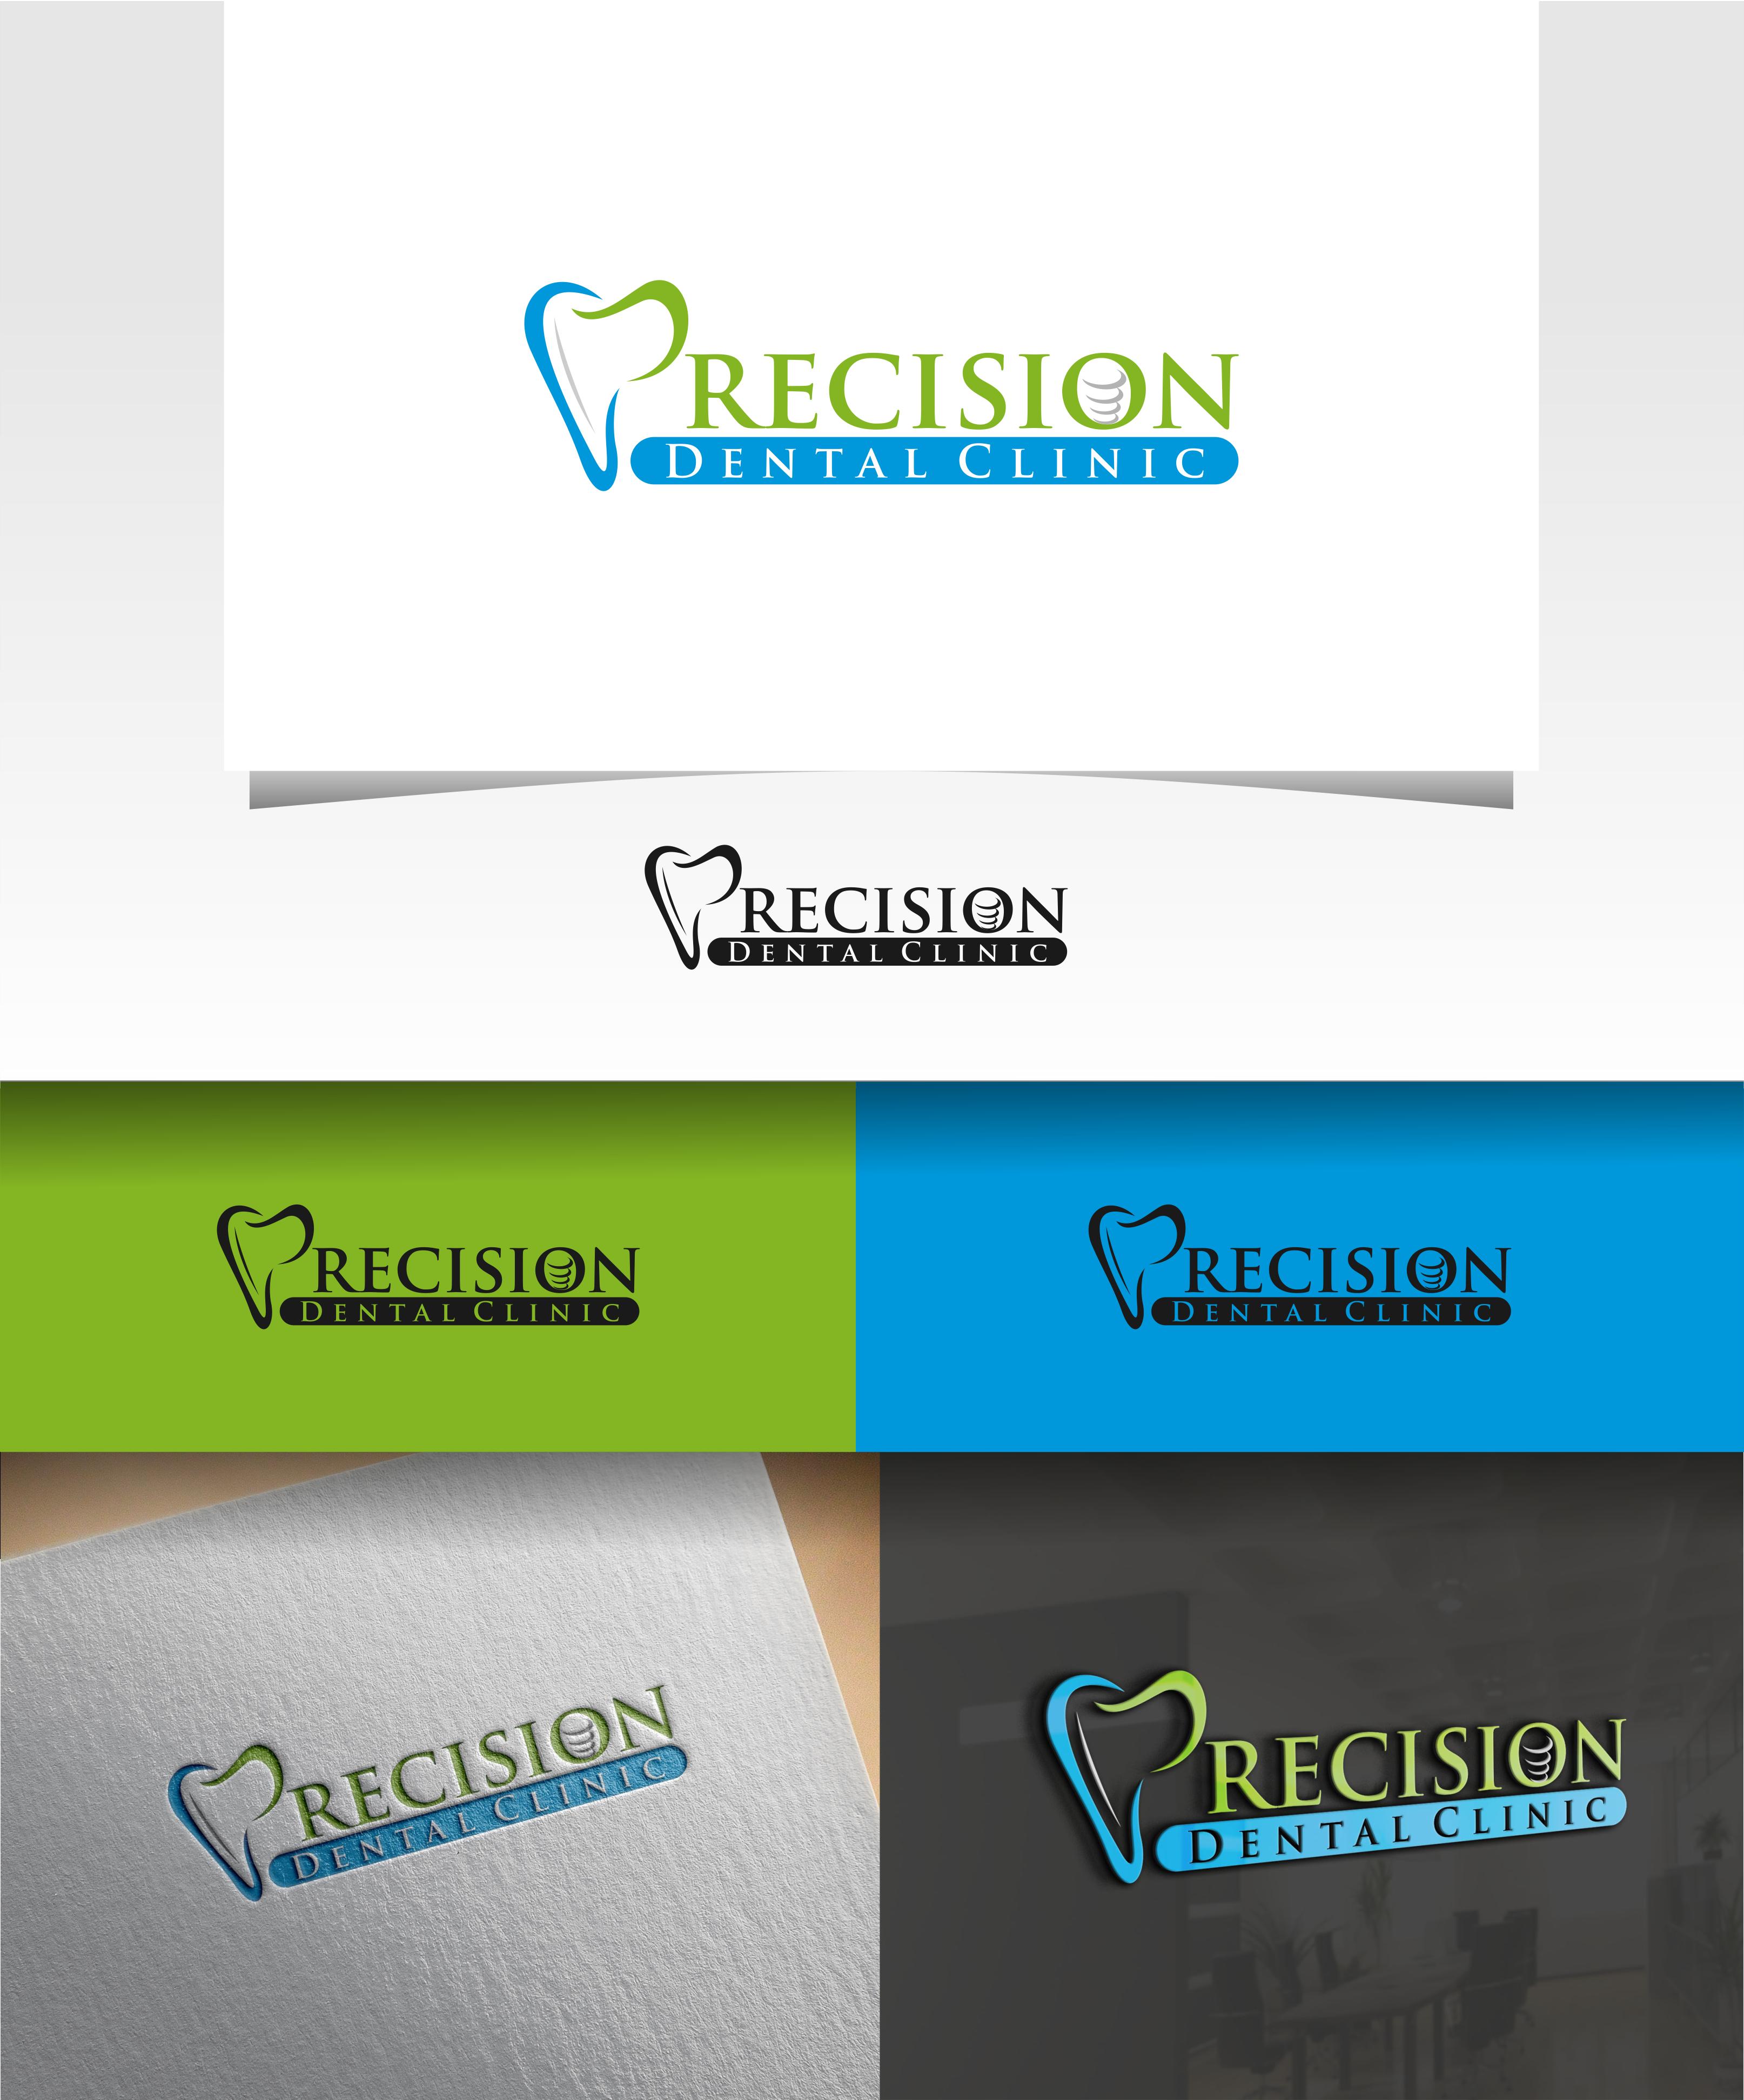 Logo Design by Raymond Garcia - Entry No. 168 in the Logo Design Contest Captivating Logo Design for Precision Dental Clinic.